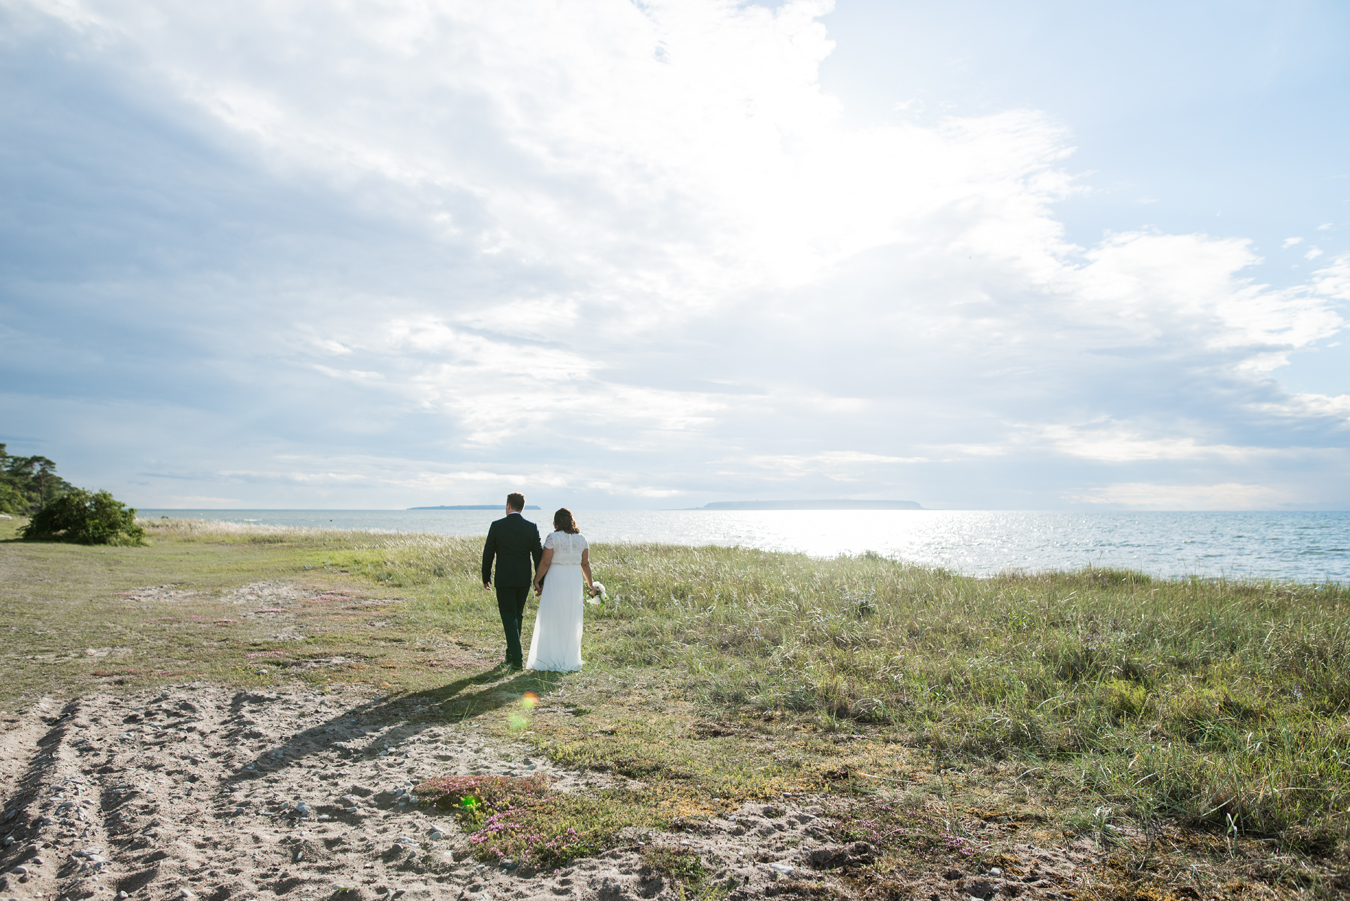 115-bröllopsfotograf-gotland-ekstakusten-neas-fotografi.jpg